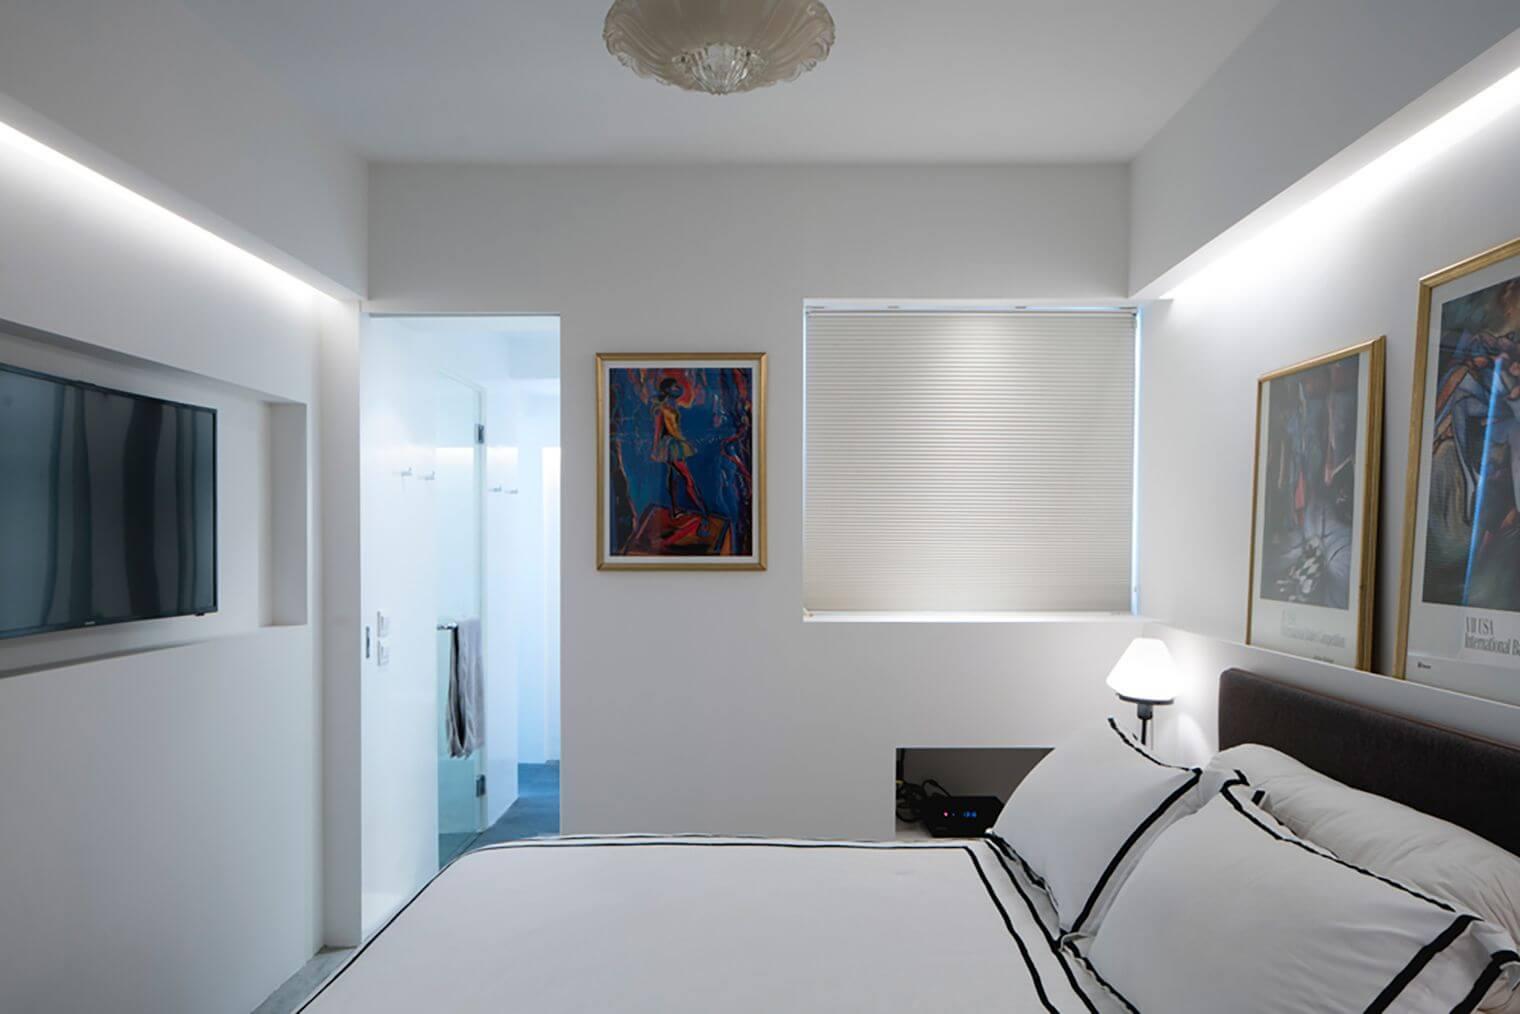 Rénovation chambre appartement moderne